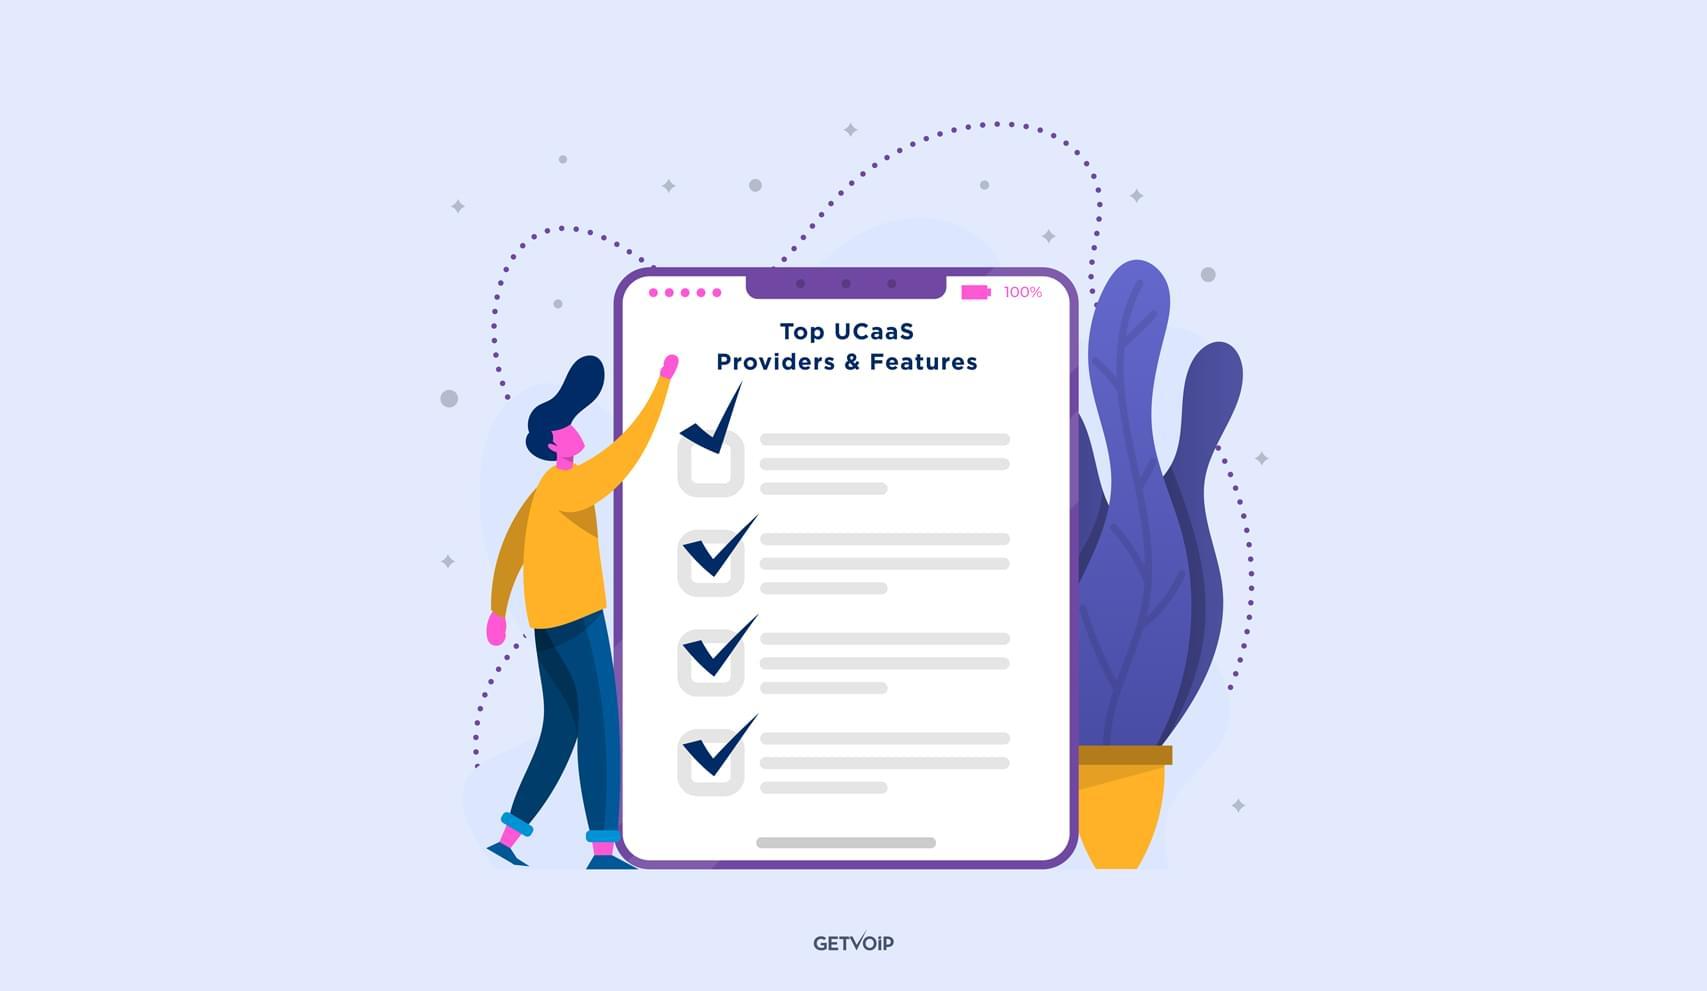 Top 7 UCaaS Providers & Features in 2021